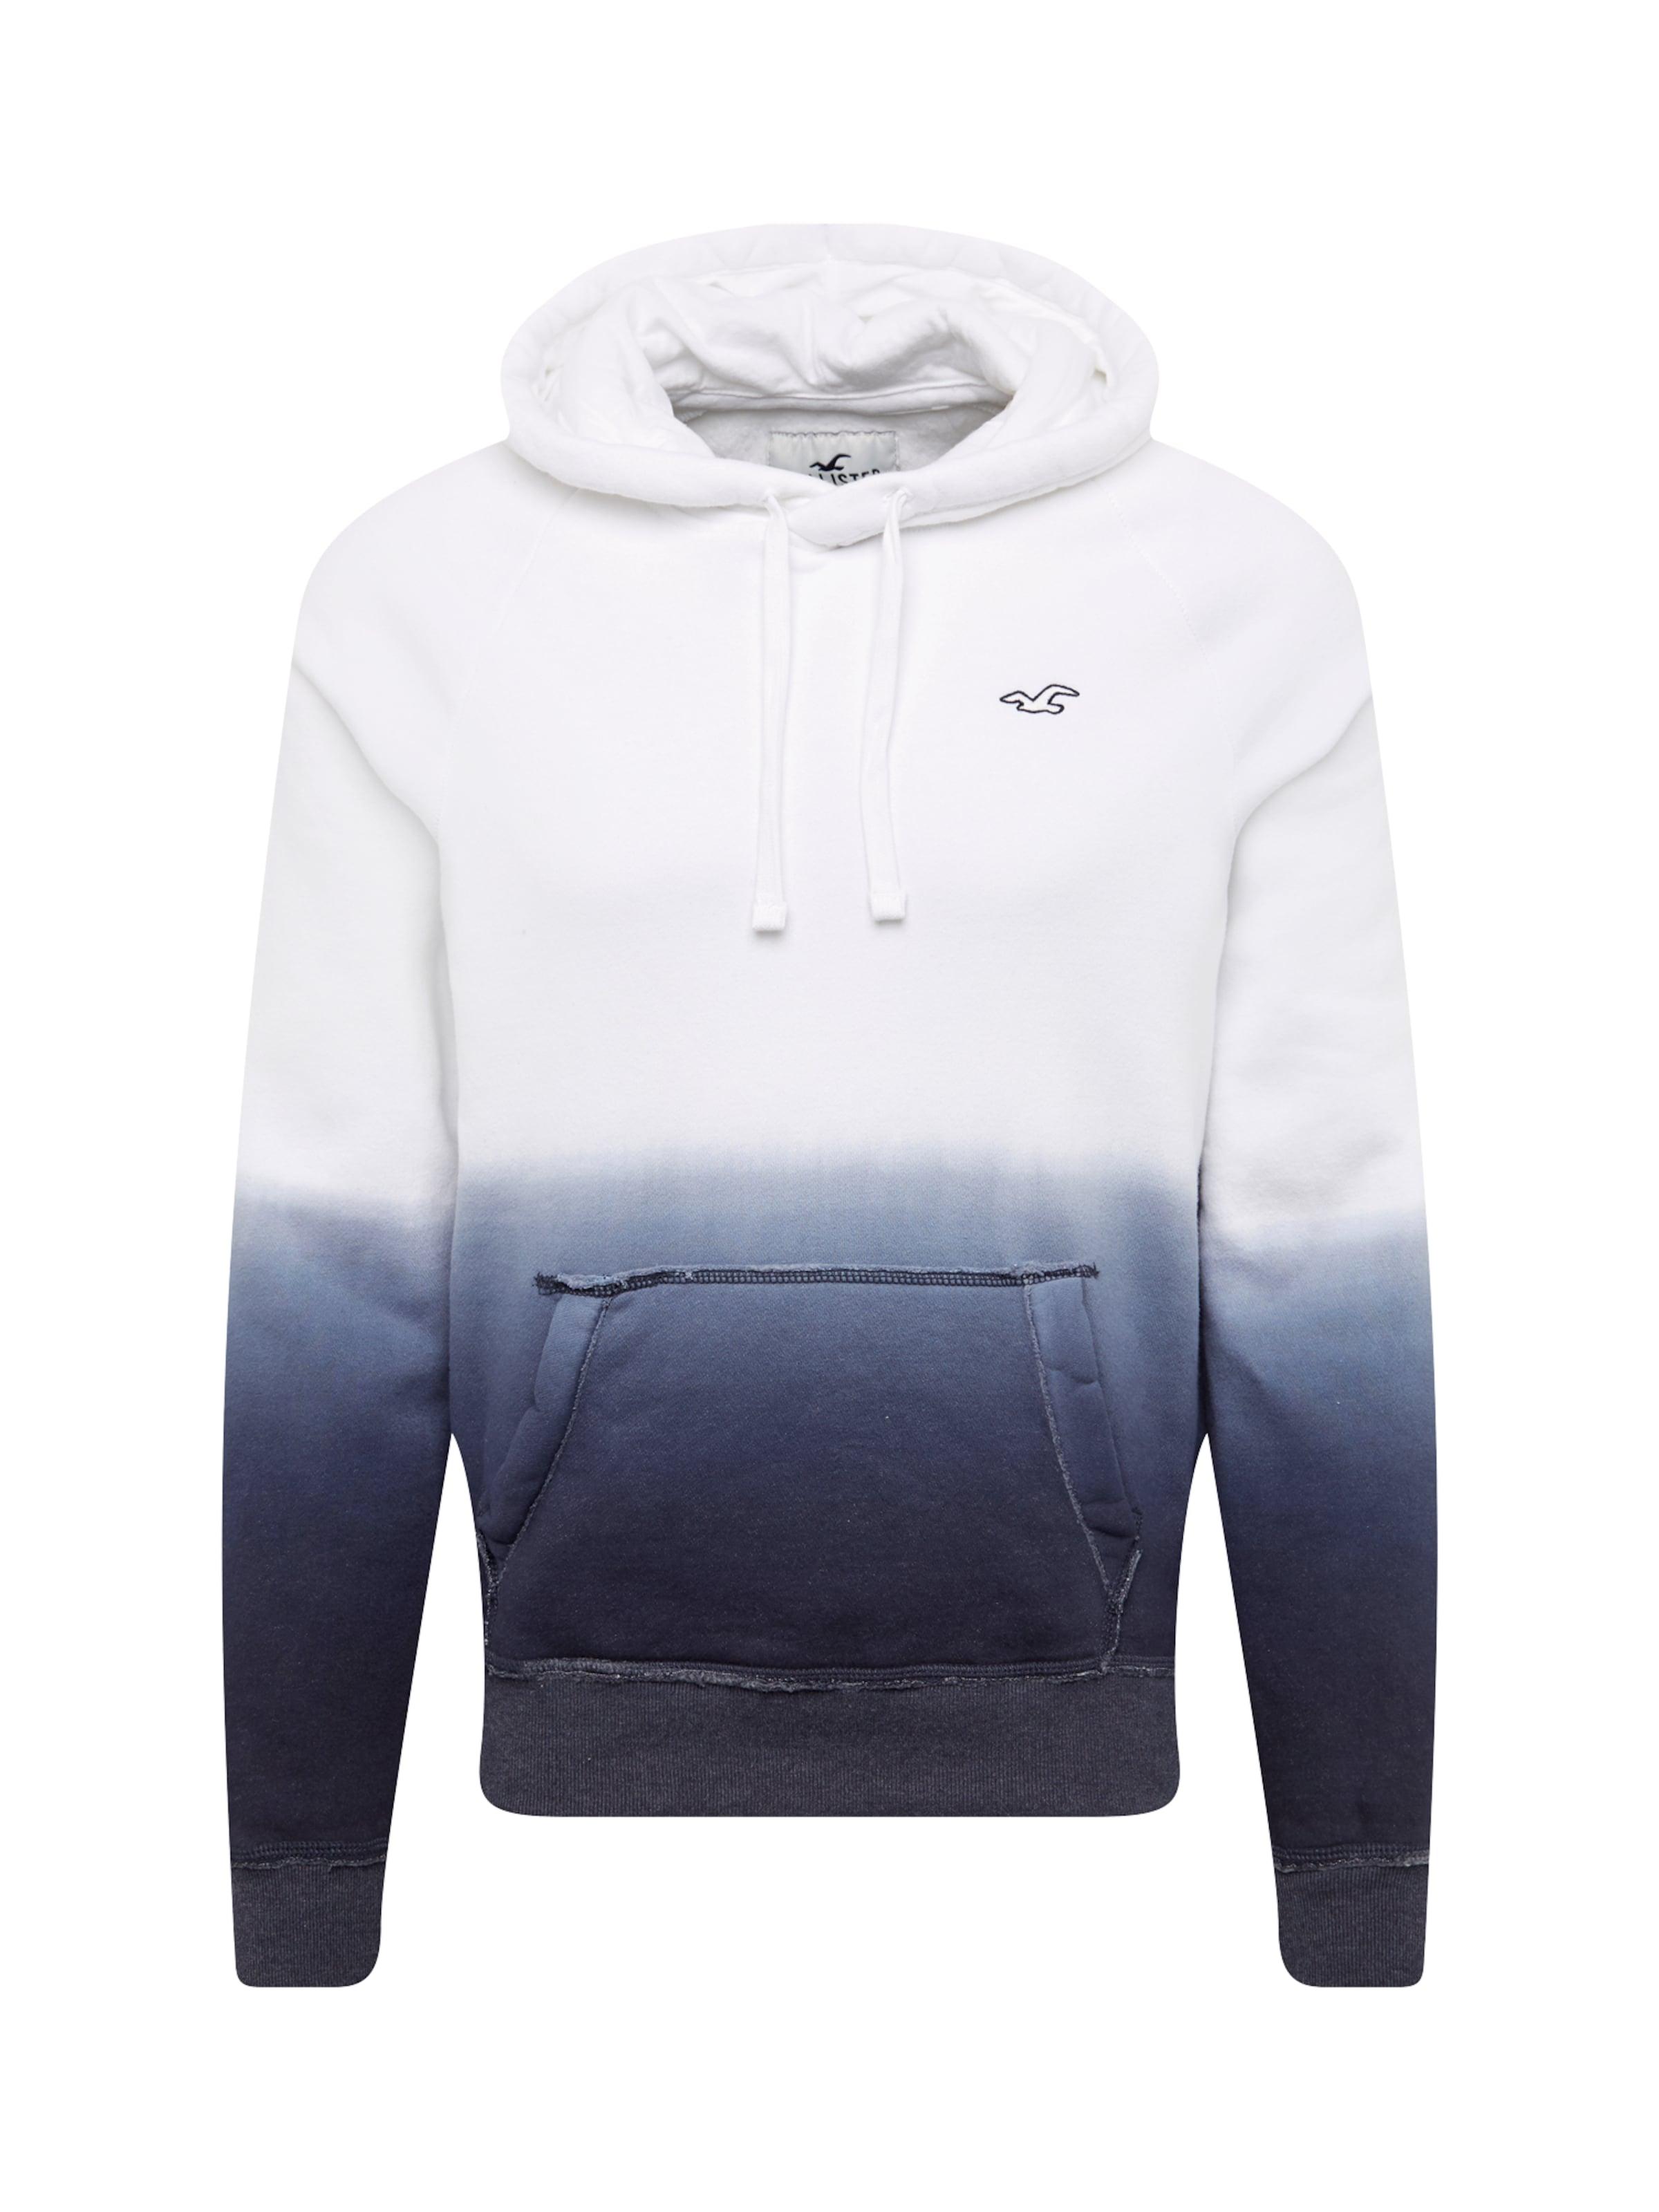 Sweatshirt 10cc' Hollister In GrauSchwarz Lc Po 'dtc EYe29IHWD